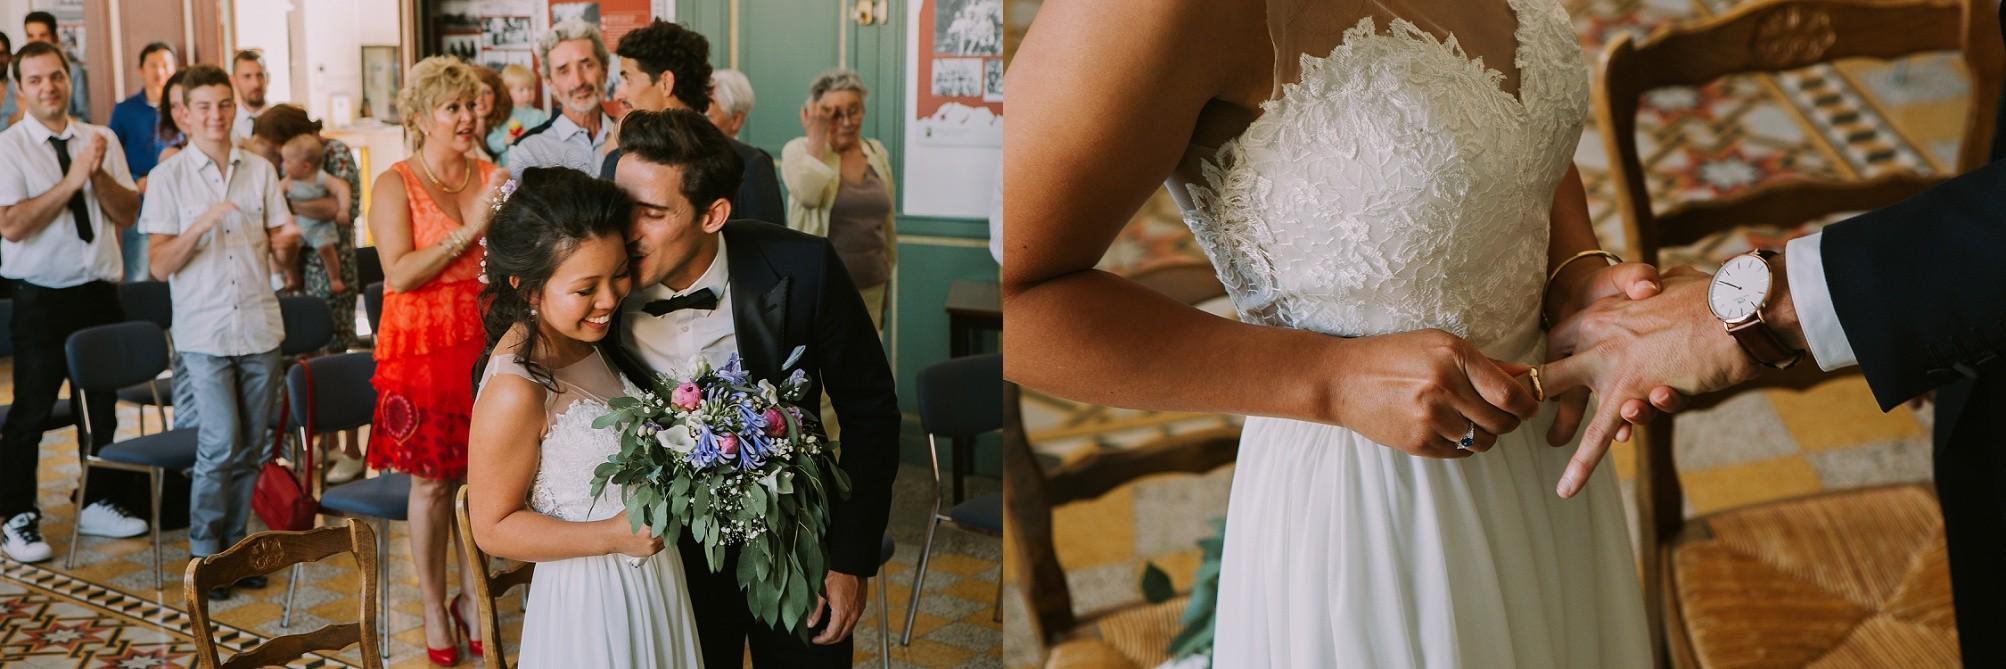 katerynaphotos-mariage-photographe-puyloubier-provence-aix-en-provence-sud-de-la-france_0364.jpg